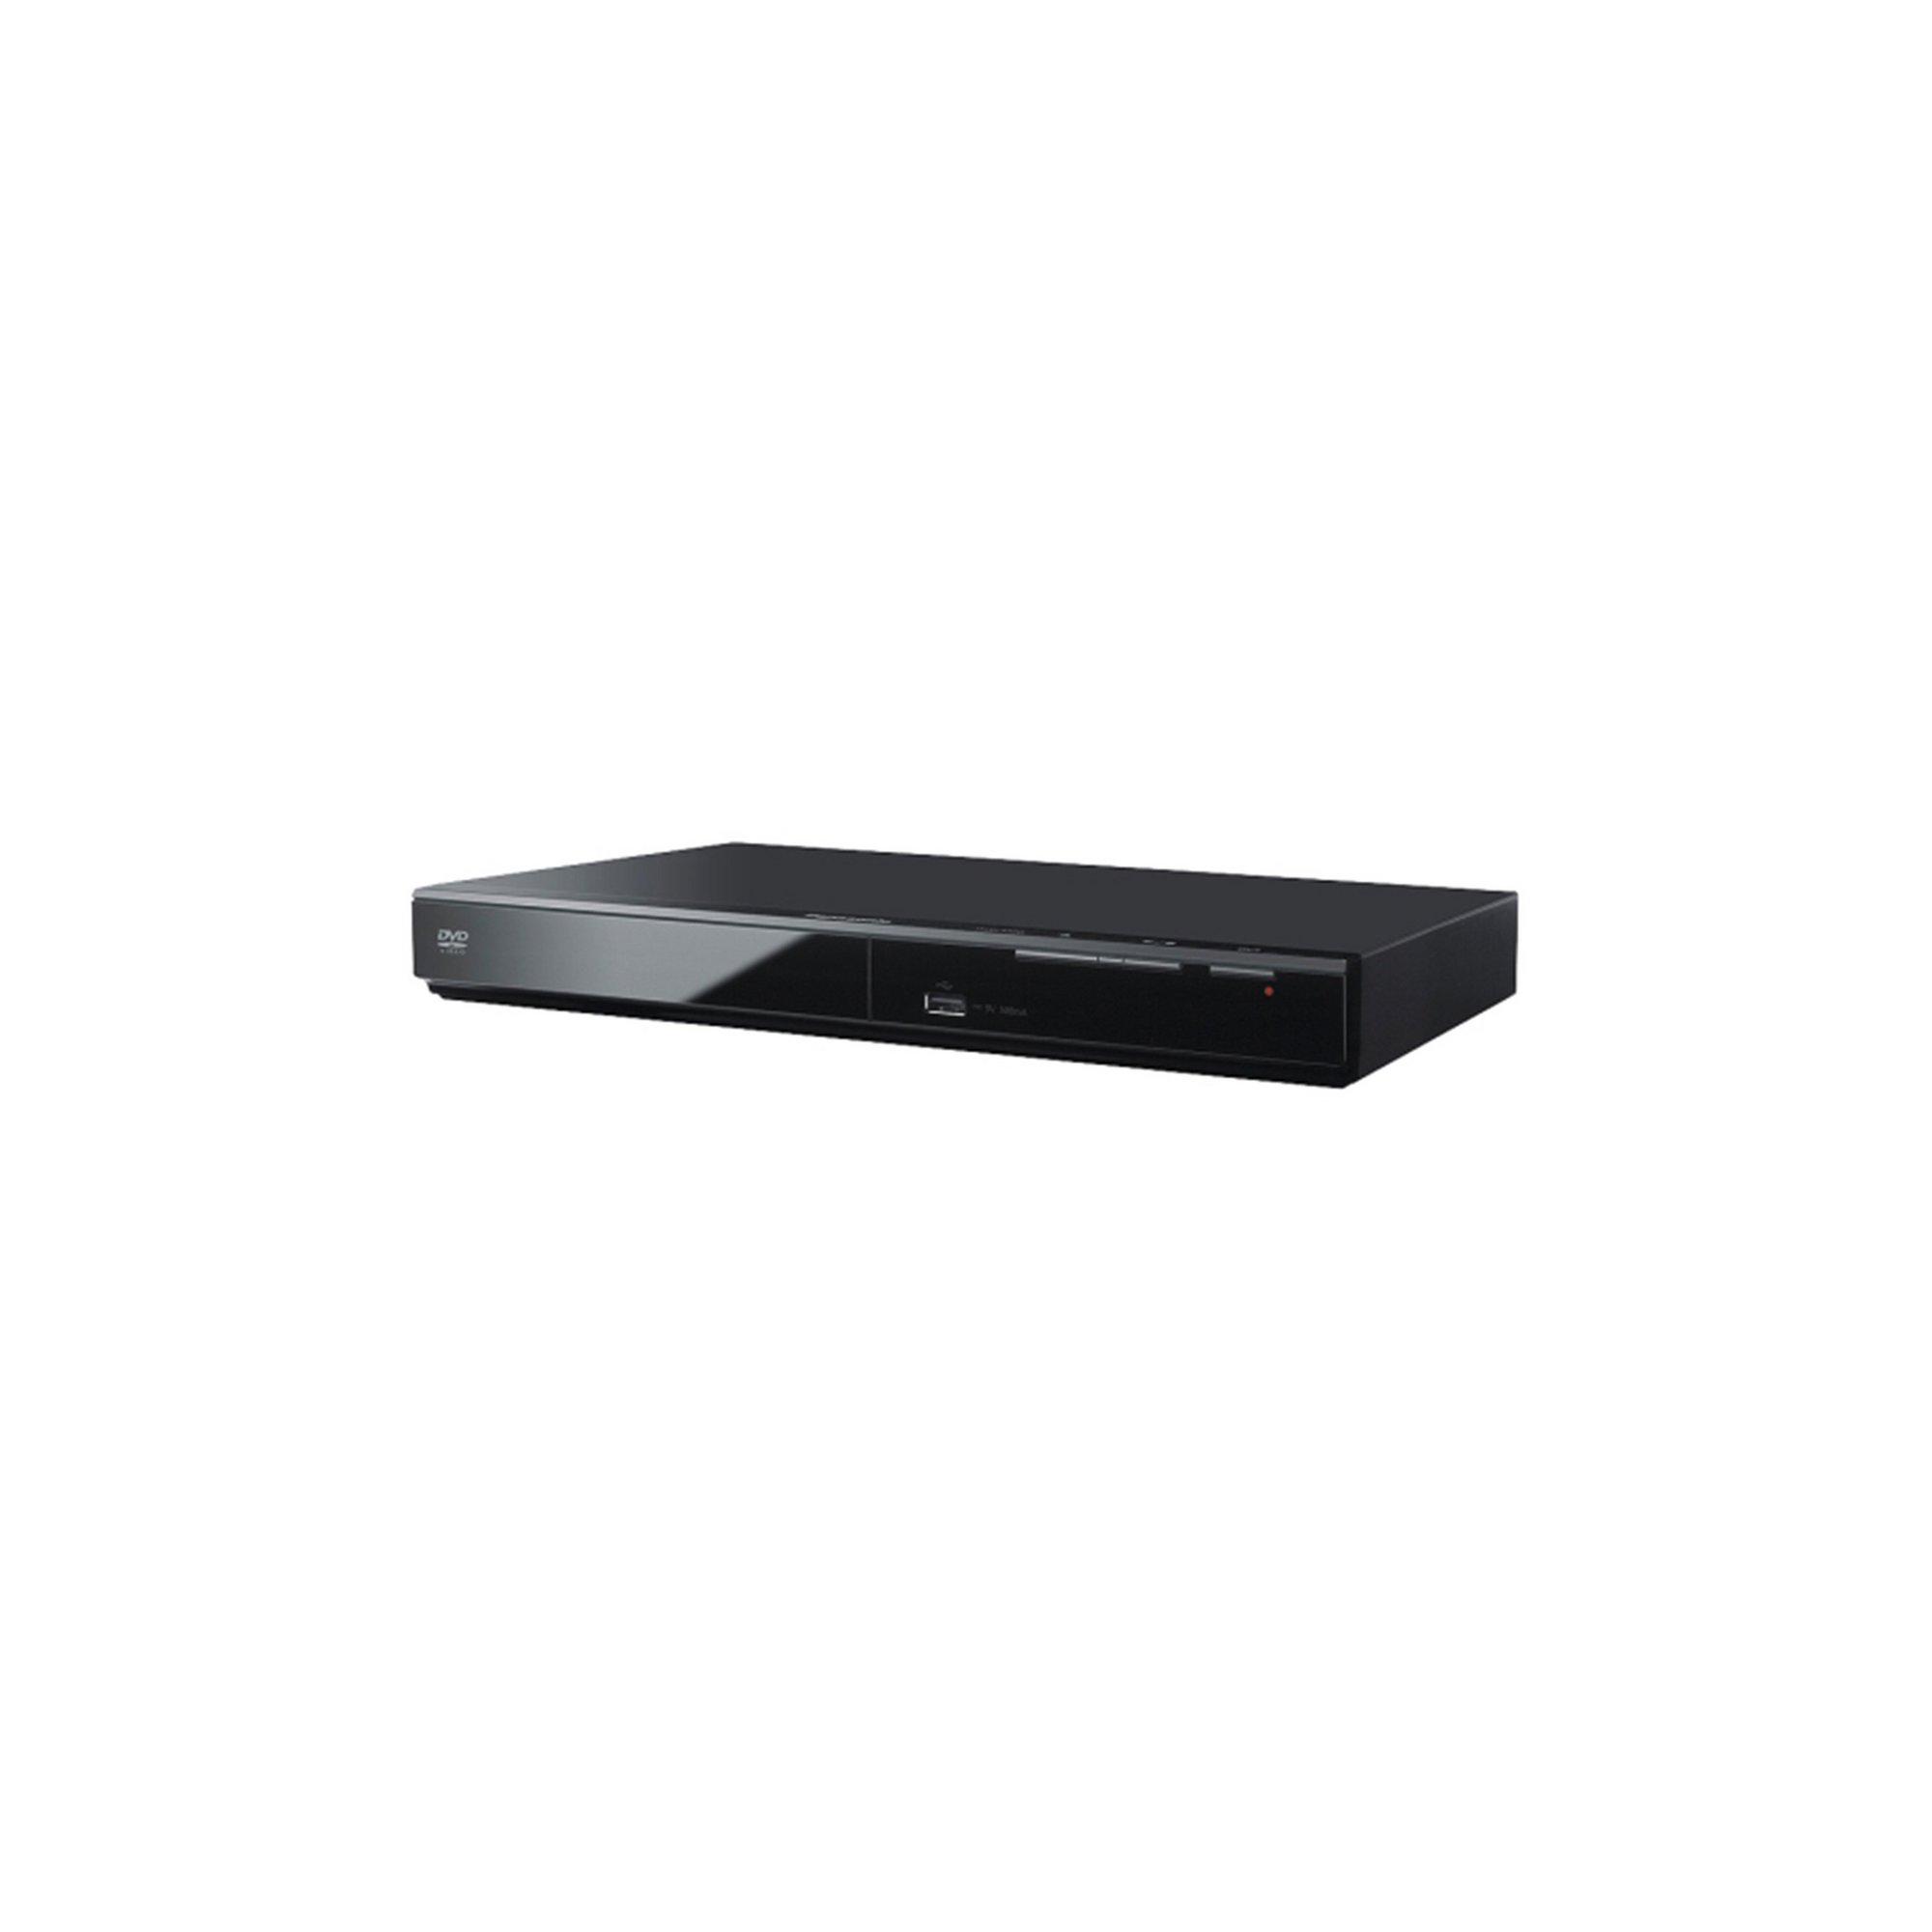 Image of Panasonic S500EB DVD Player